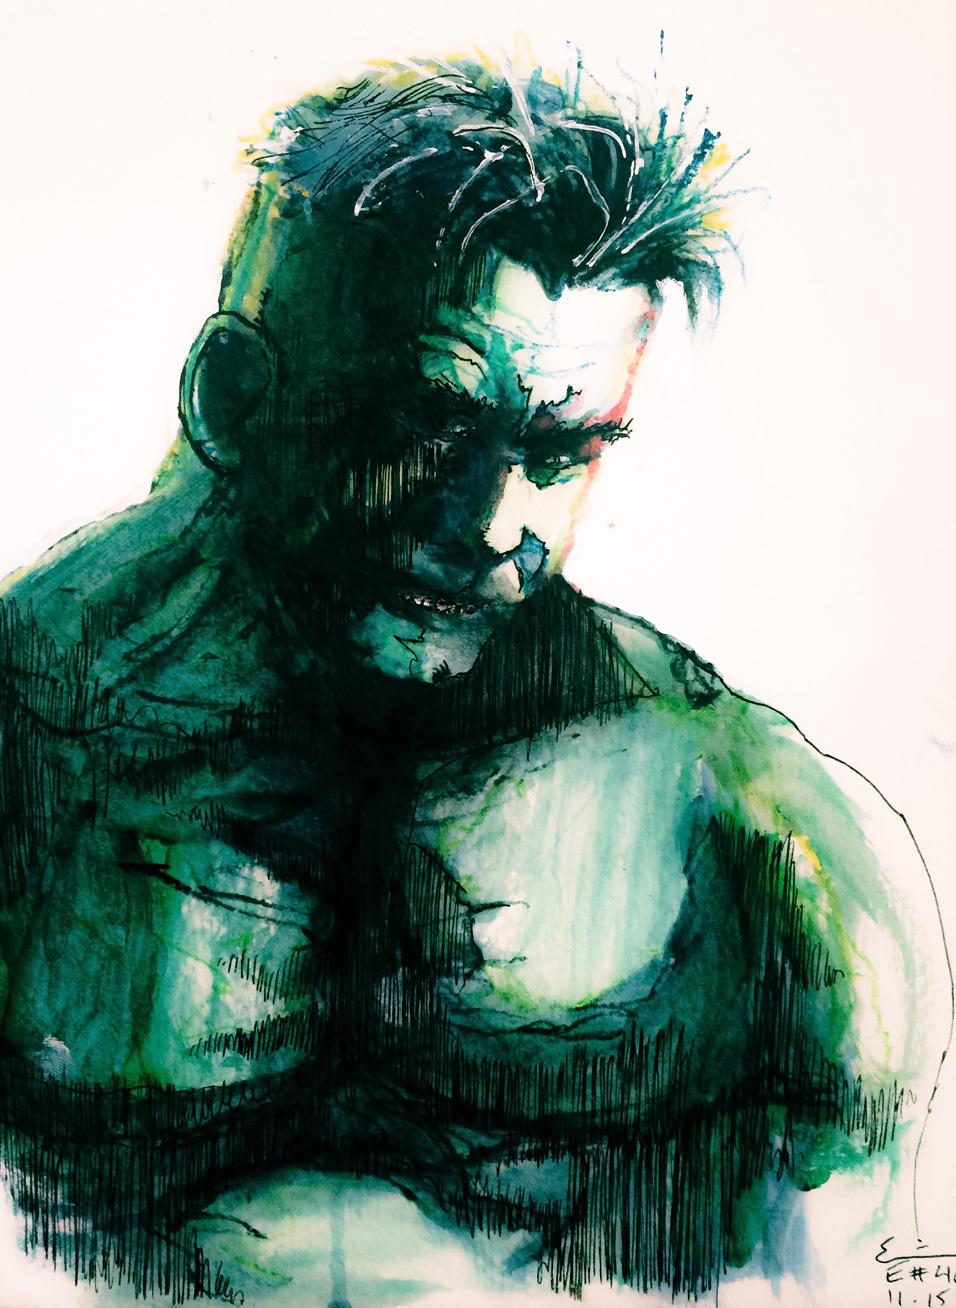 11.15.2015 Everyday Number 46 Sad Hulk